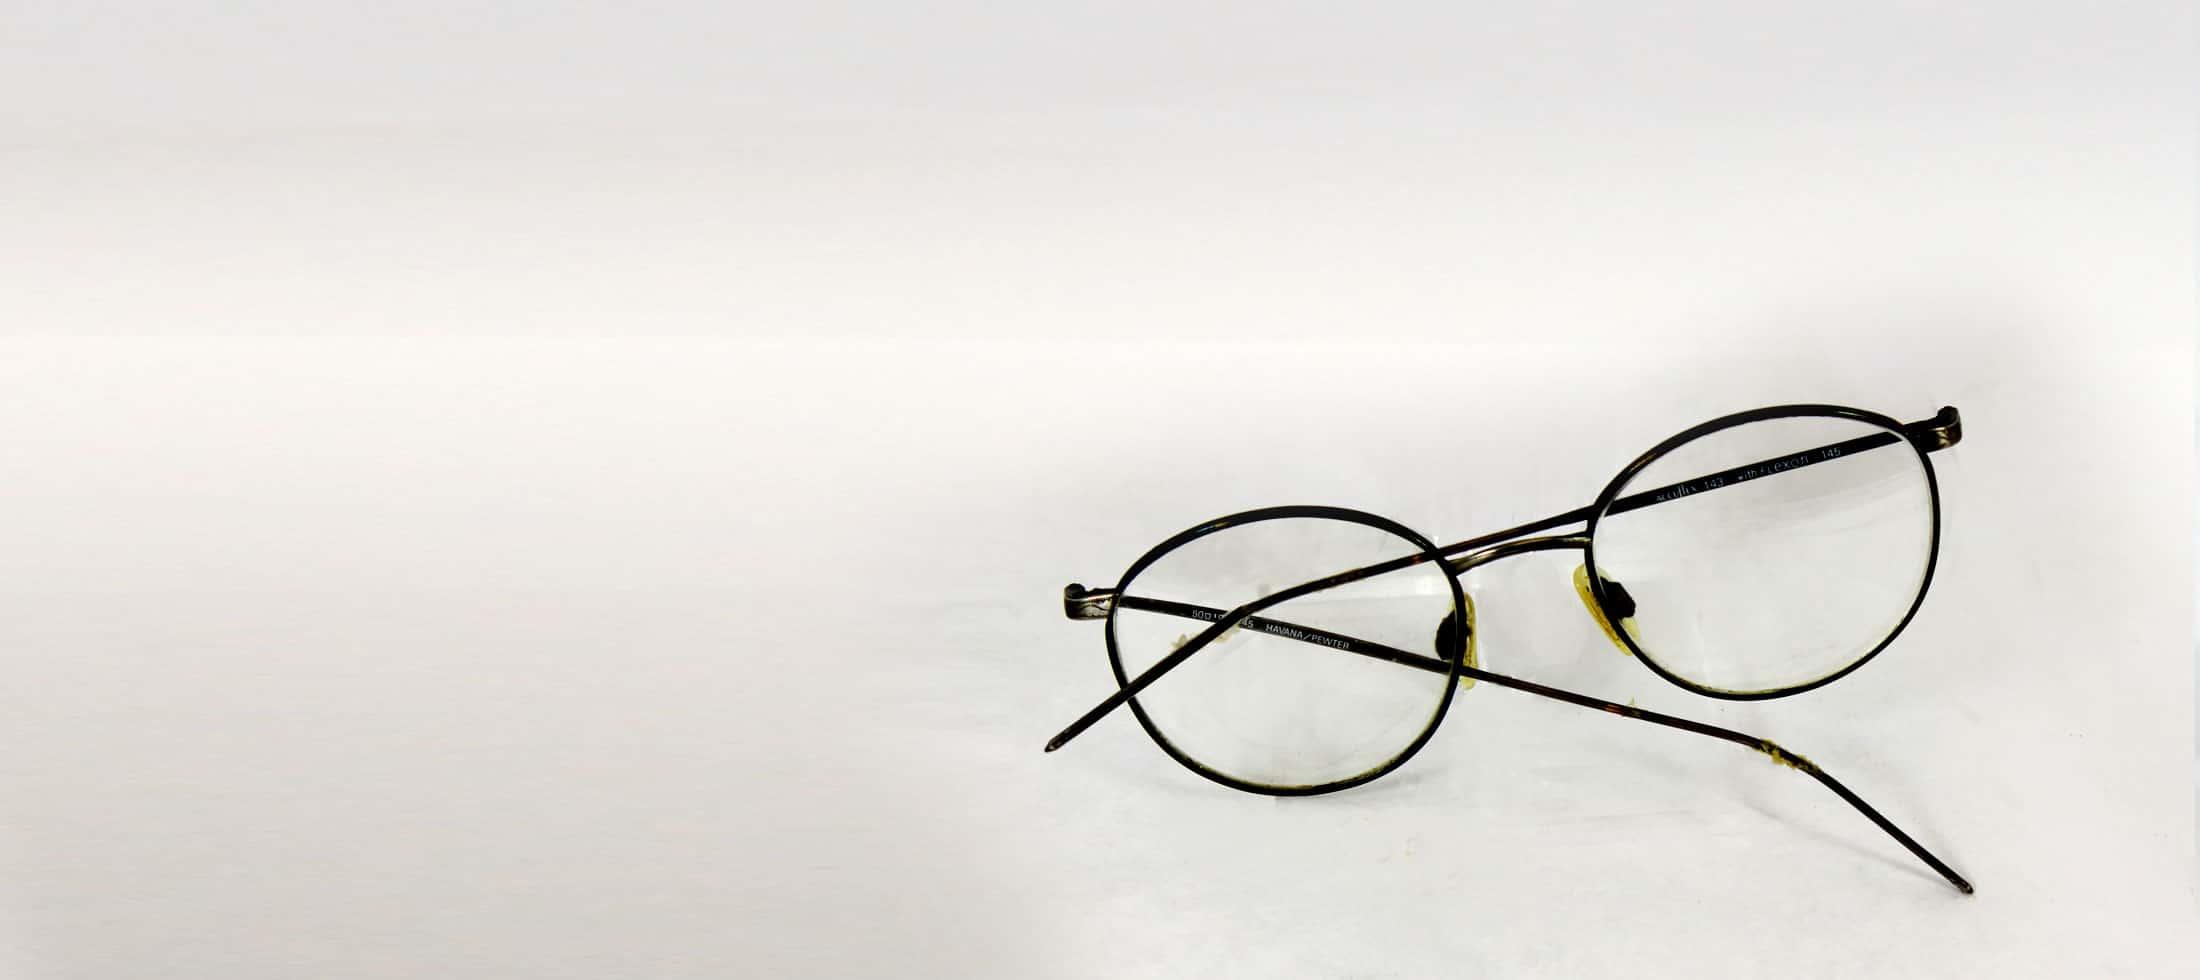 Fix Bent Glasses Frame